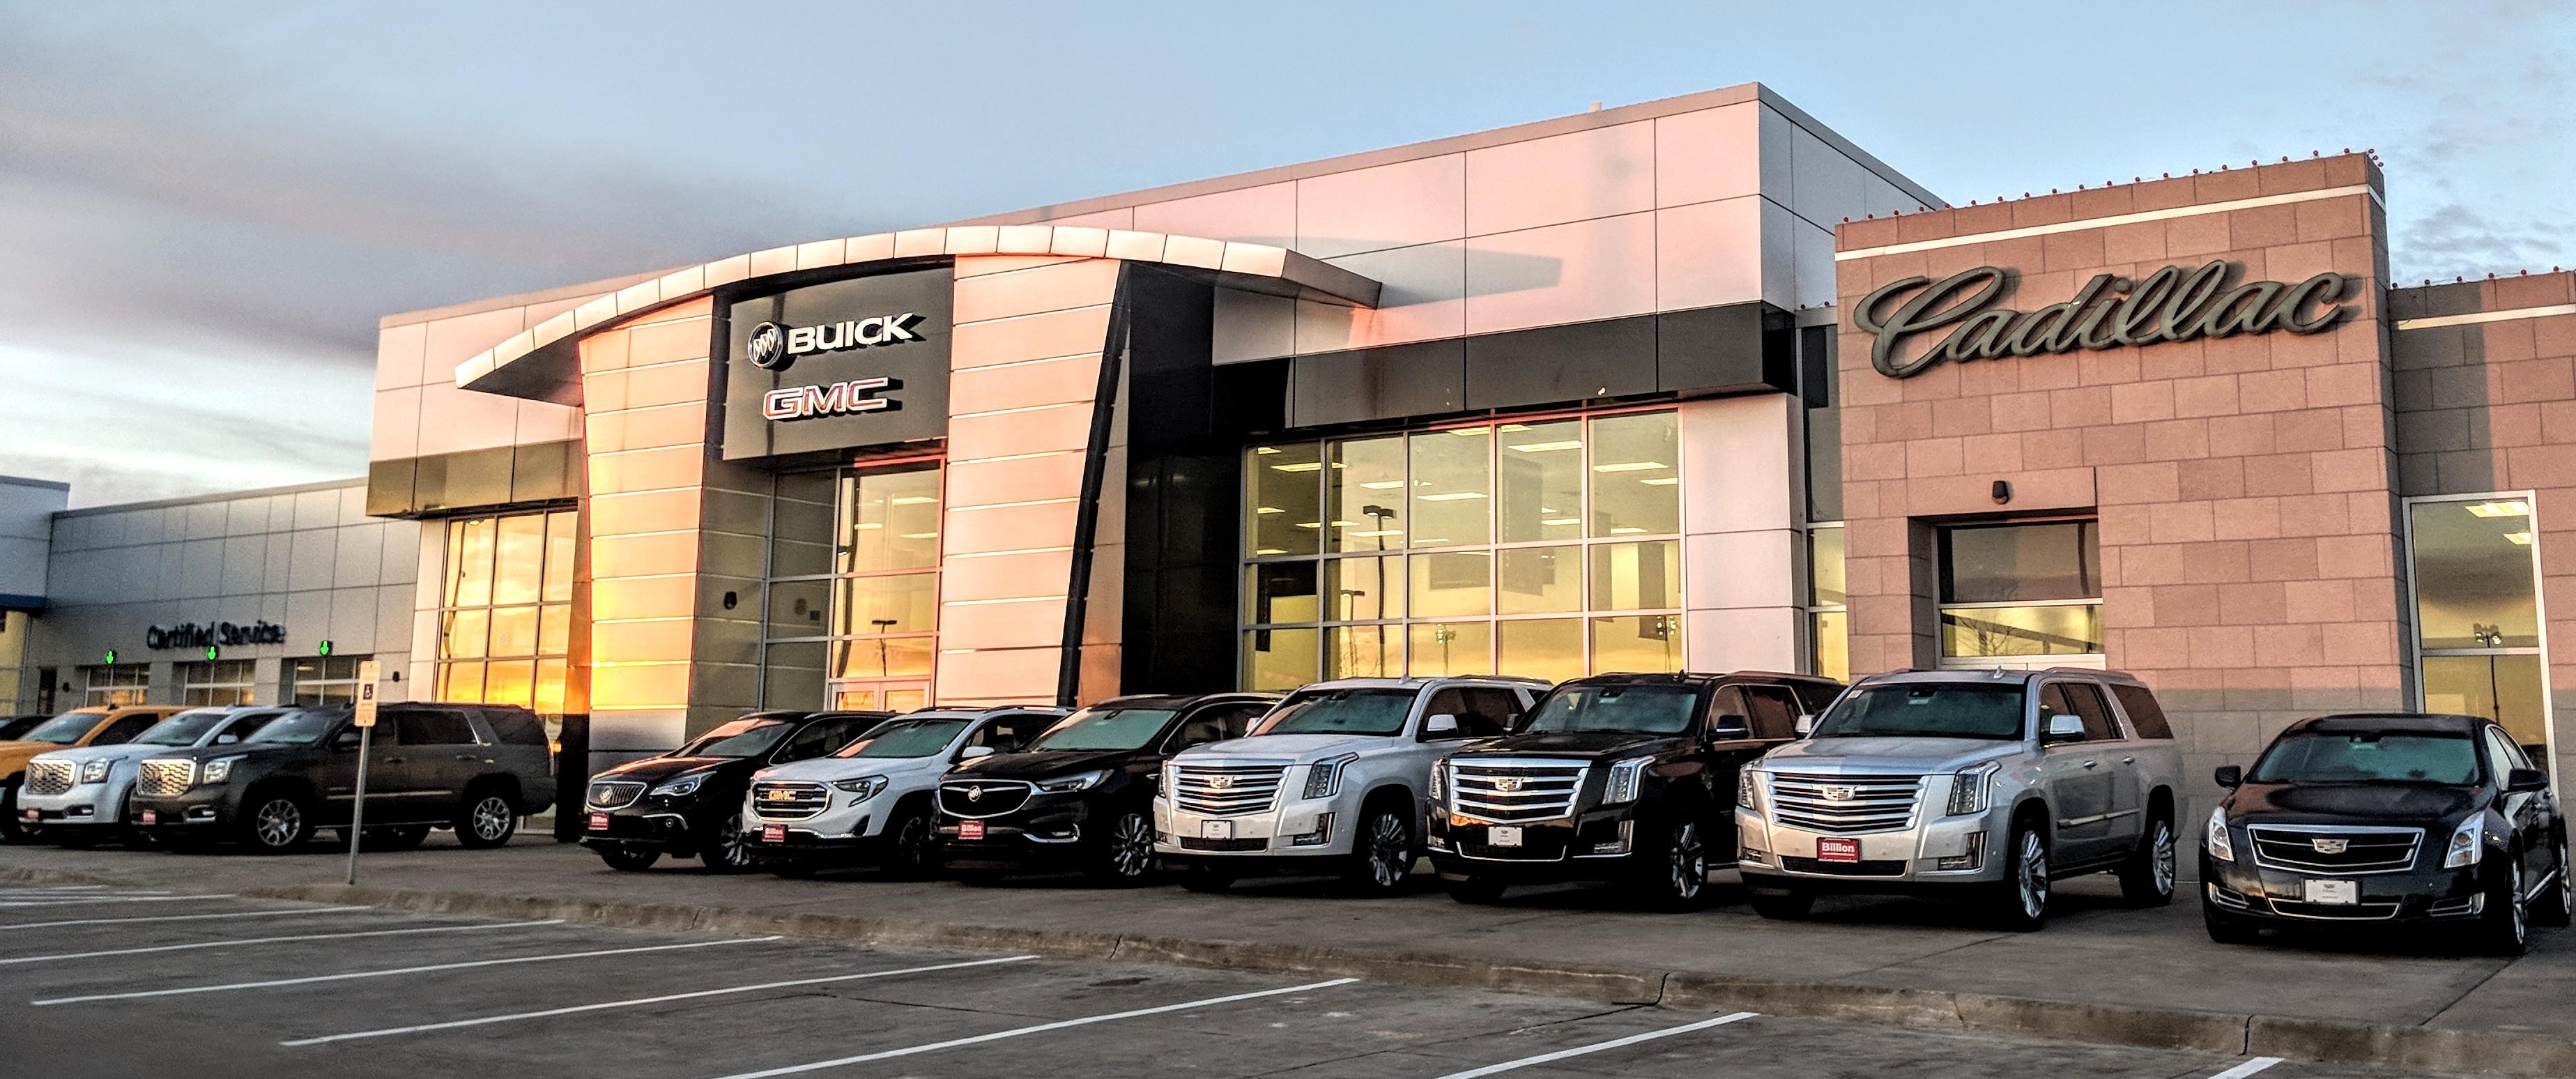 Billion GMC Cadillac - Iowa City